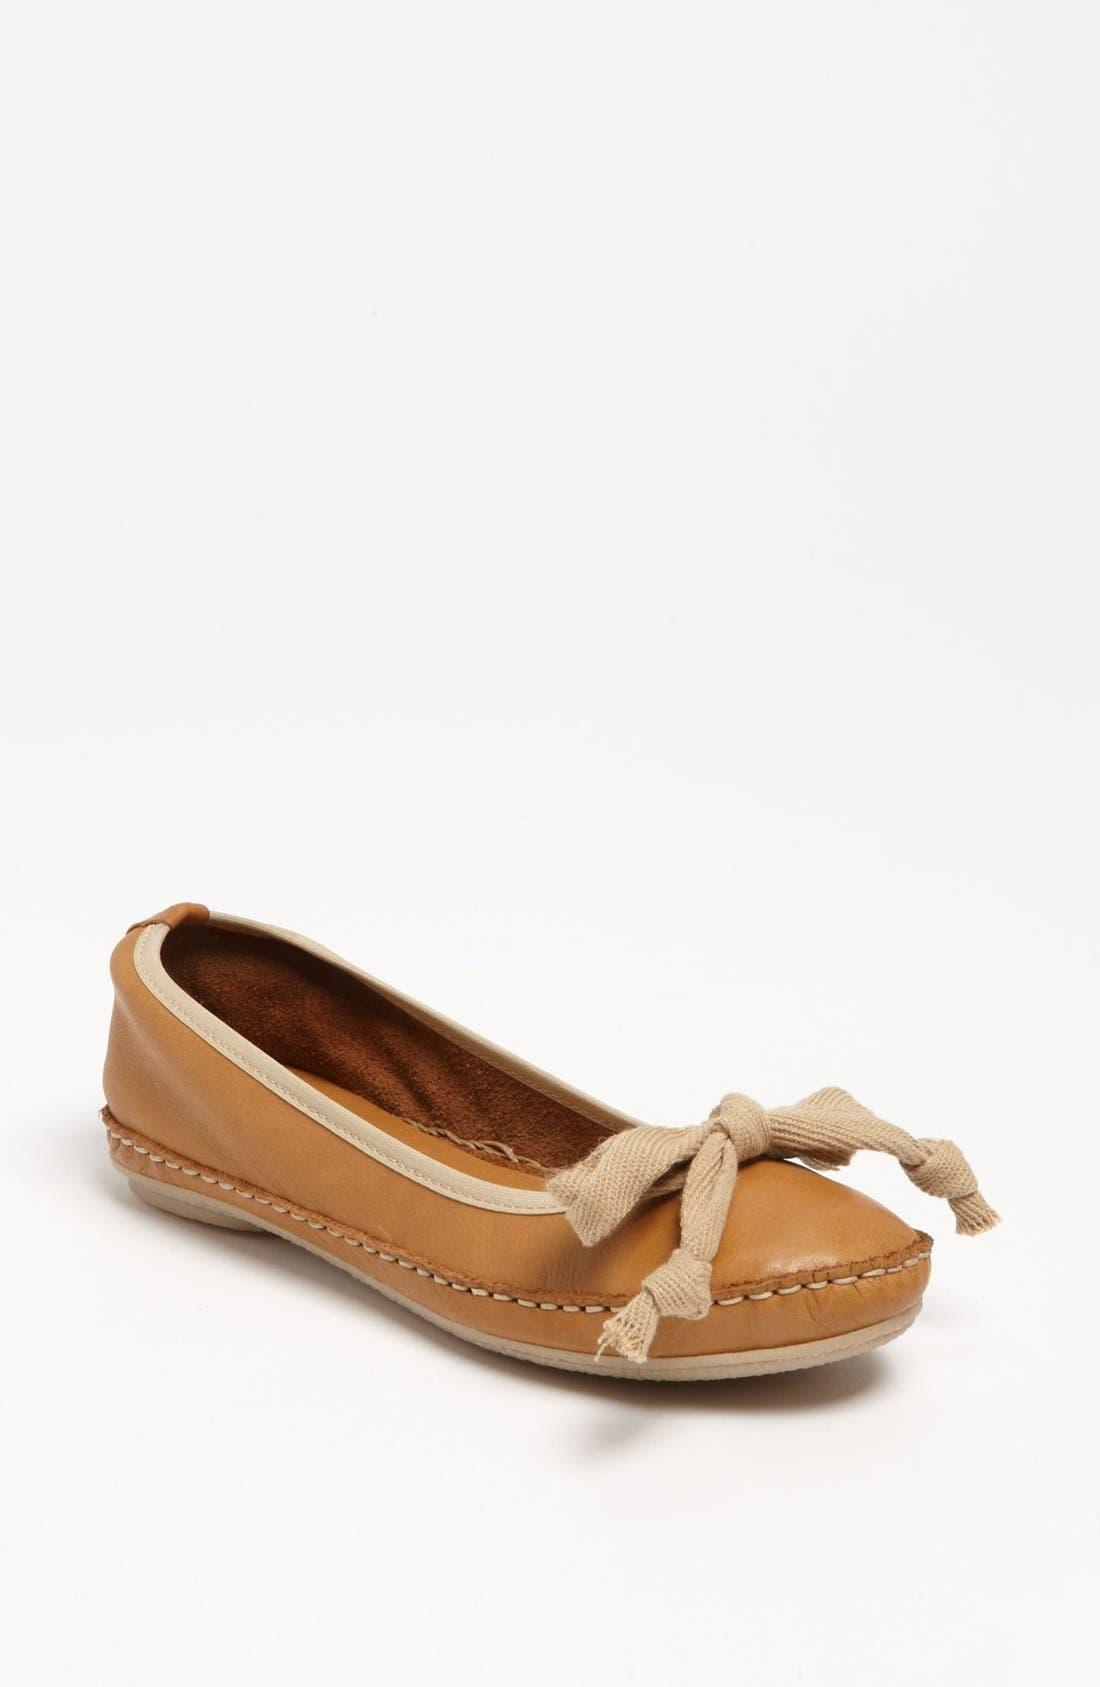 Main Image - Giove Leather Flat